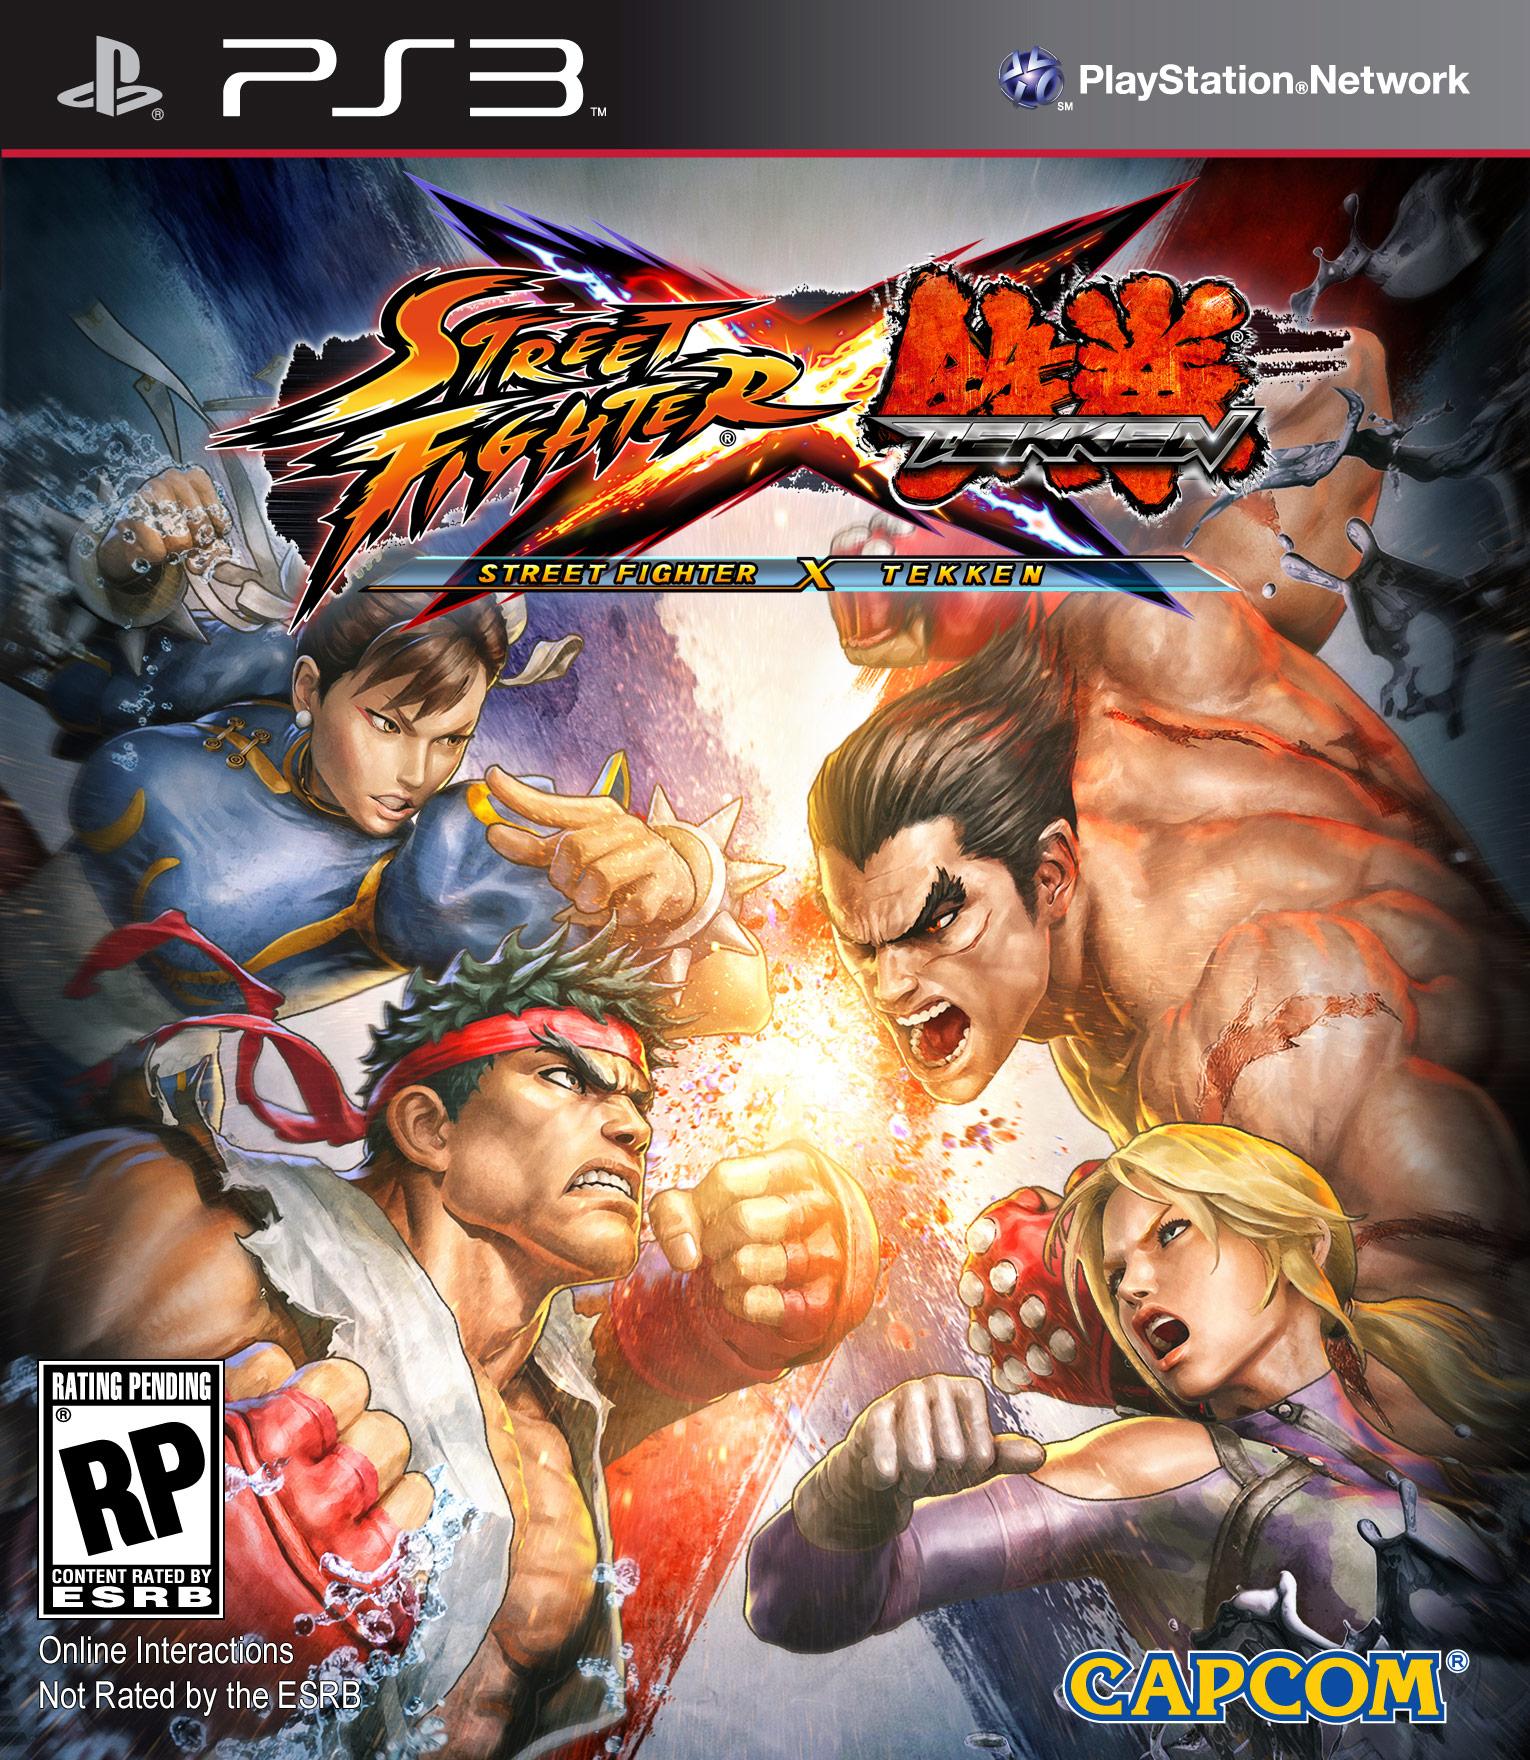 Cover artwork for Street Fighter X Tekken on the PlayStation 3